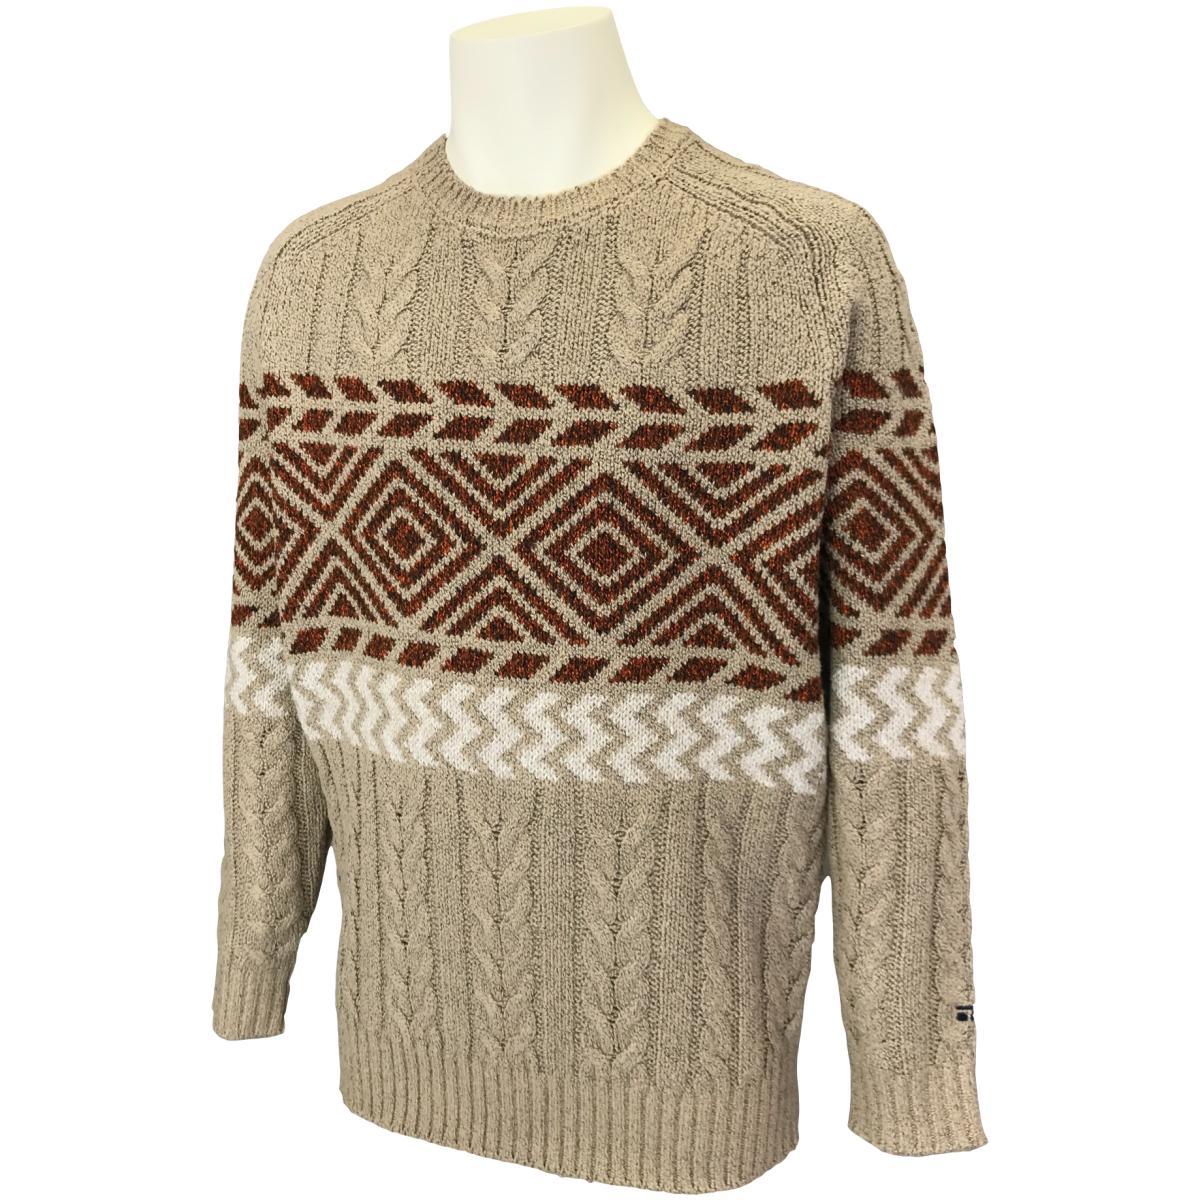 MIXネップセーター